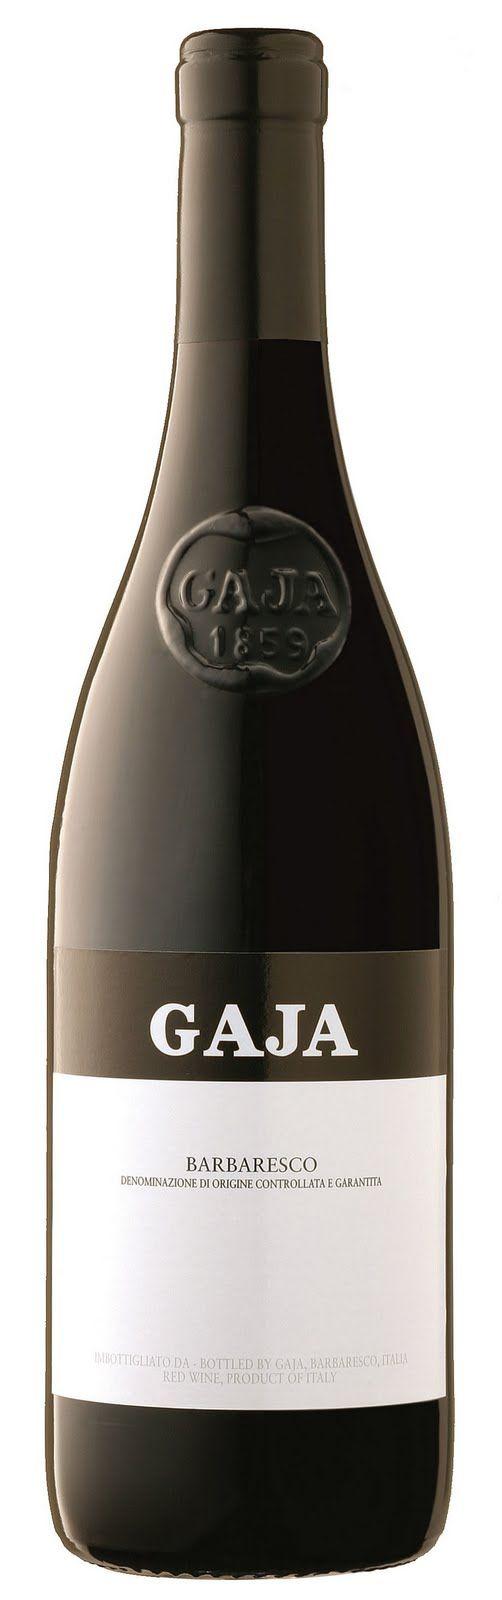 Gaja - Barbaresco 2008